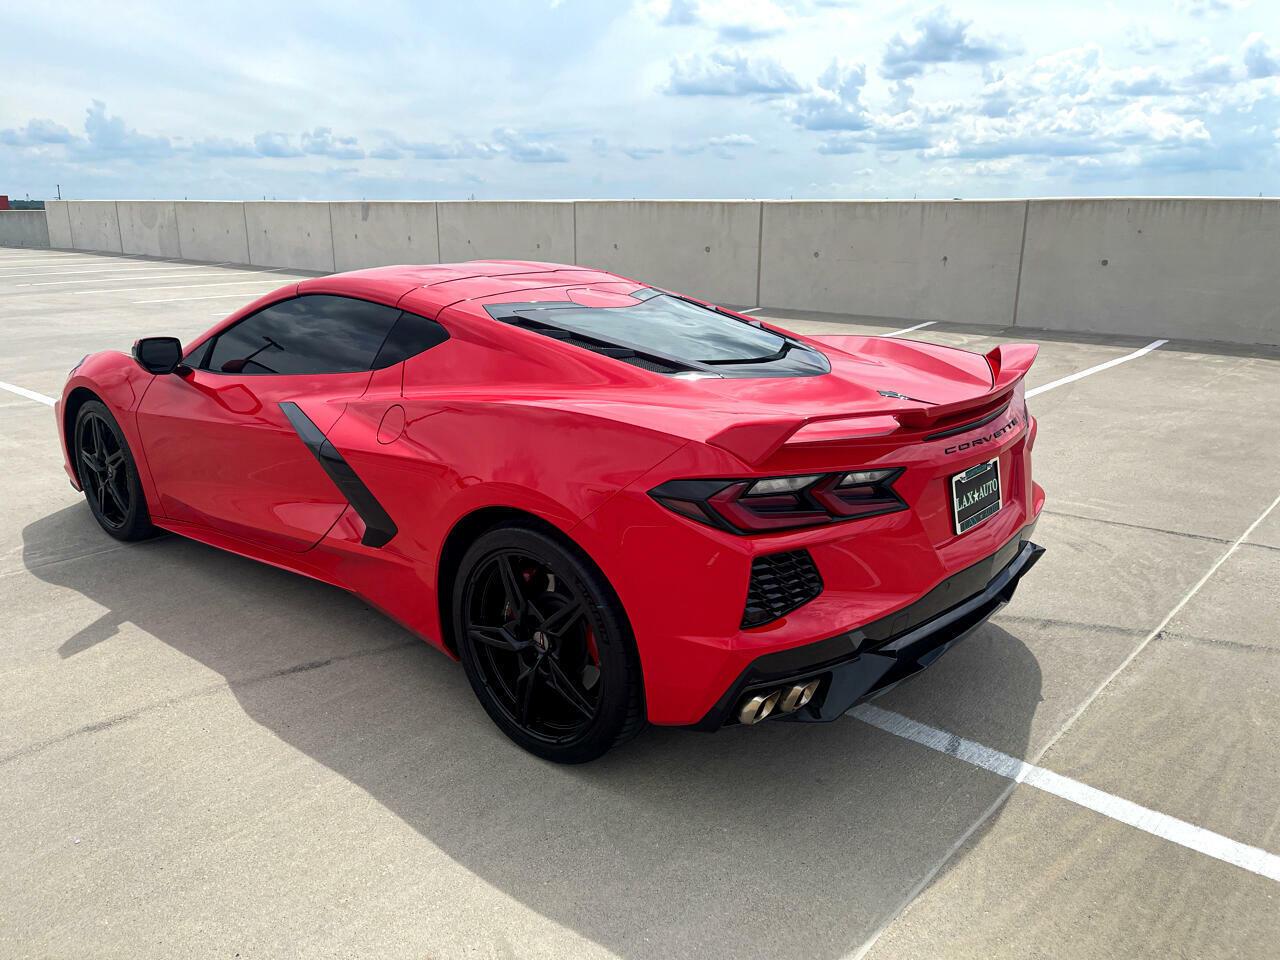 2020 Red Chevrolet Corvette Coupe 1LT | C7 Corvette Photo 4